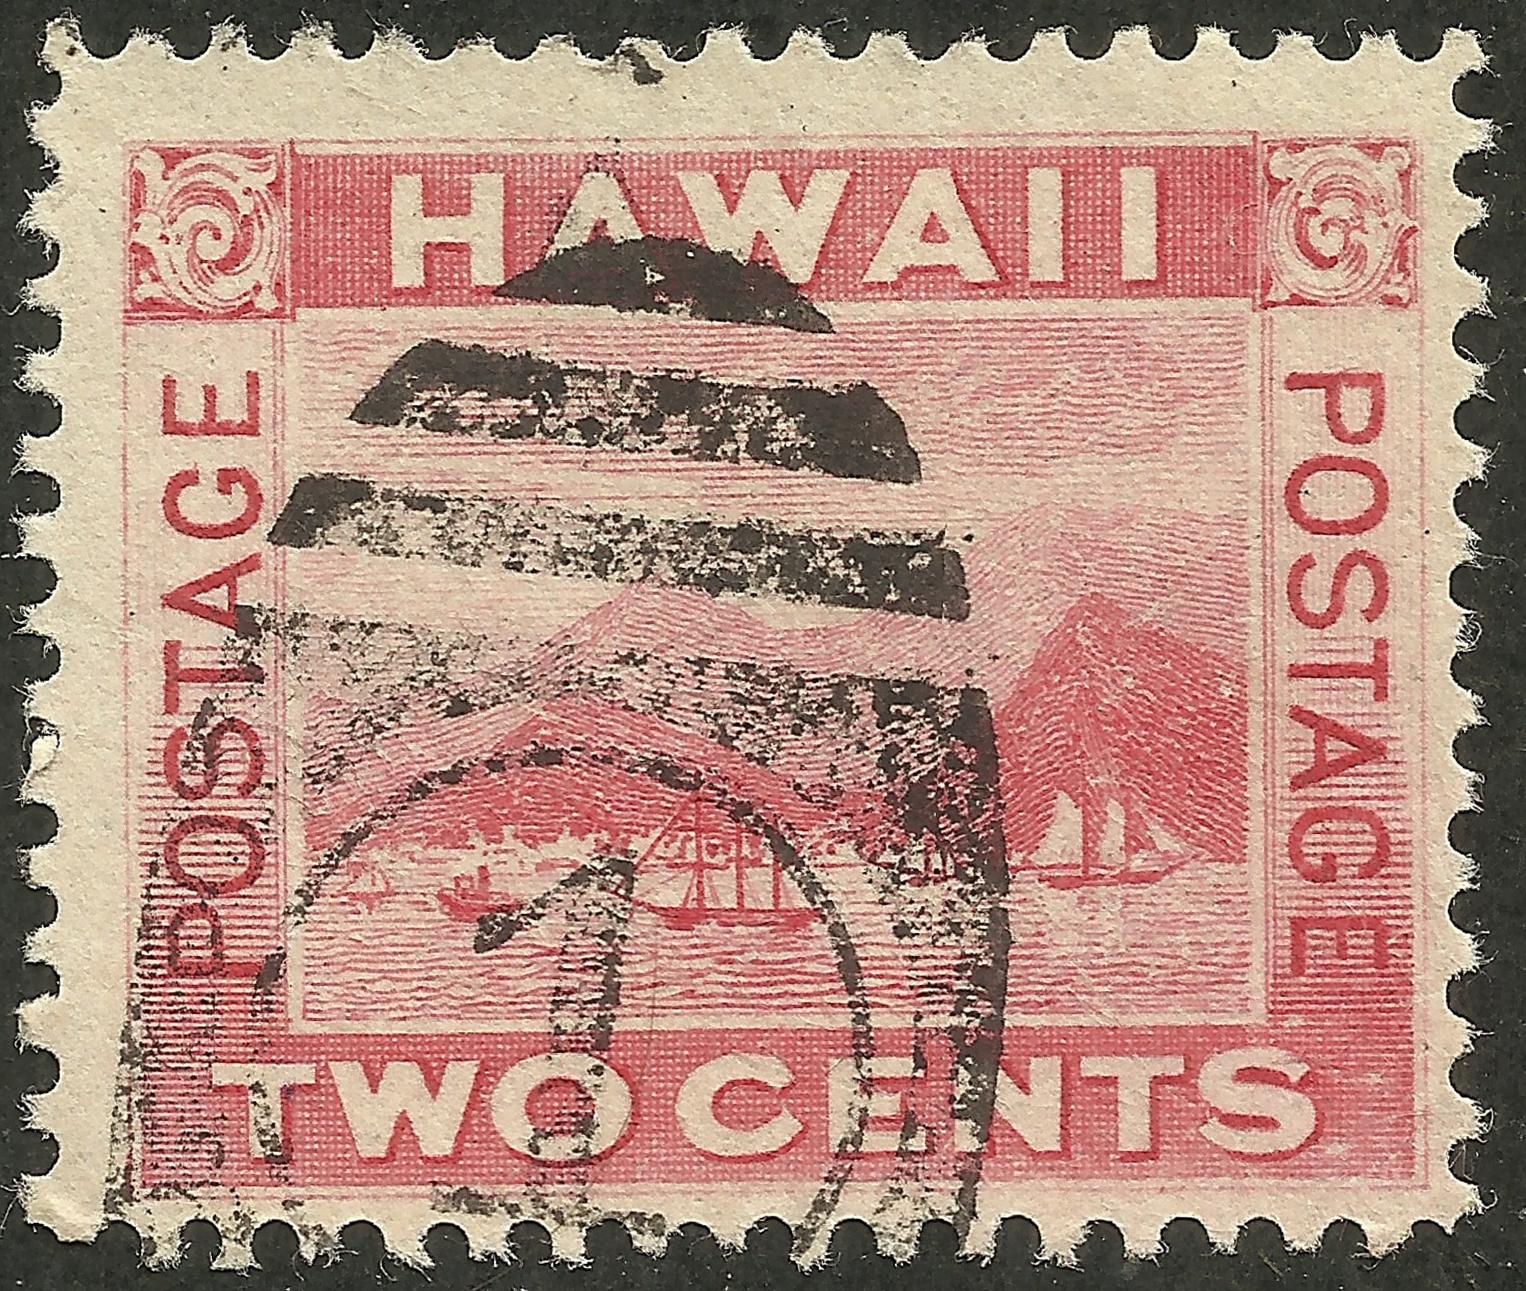 Hawaii Under U.S. Administration - Scott #81 (1899)